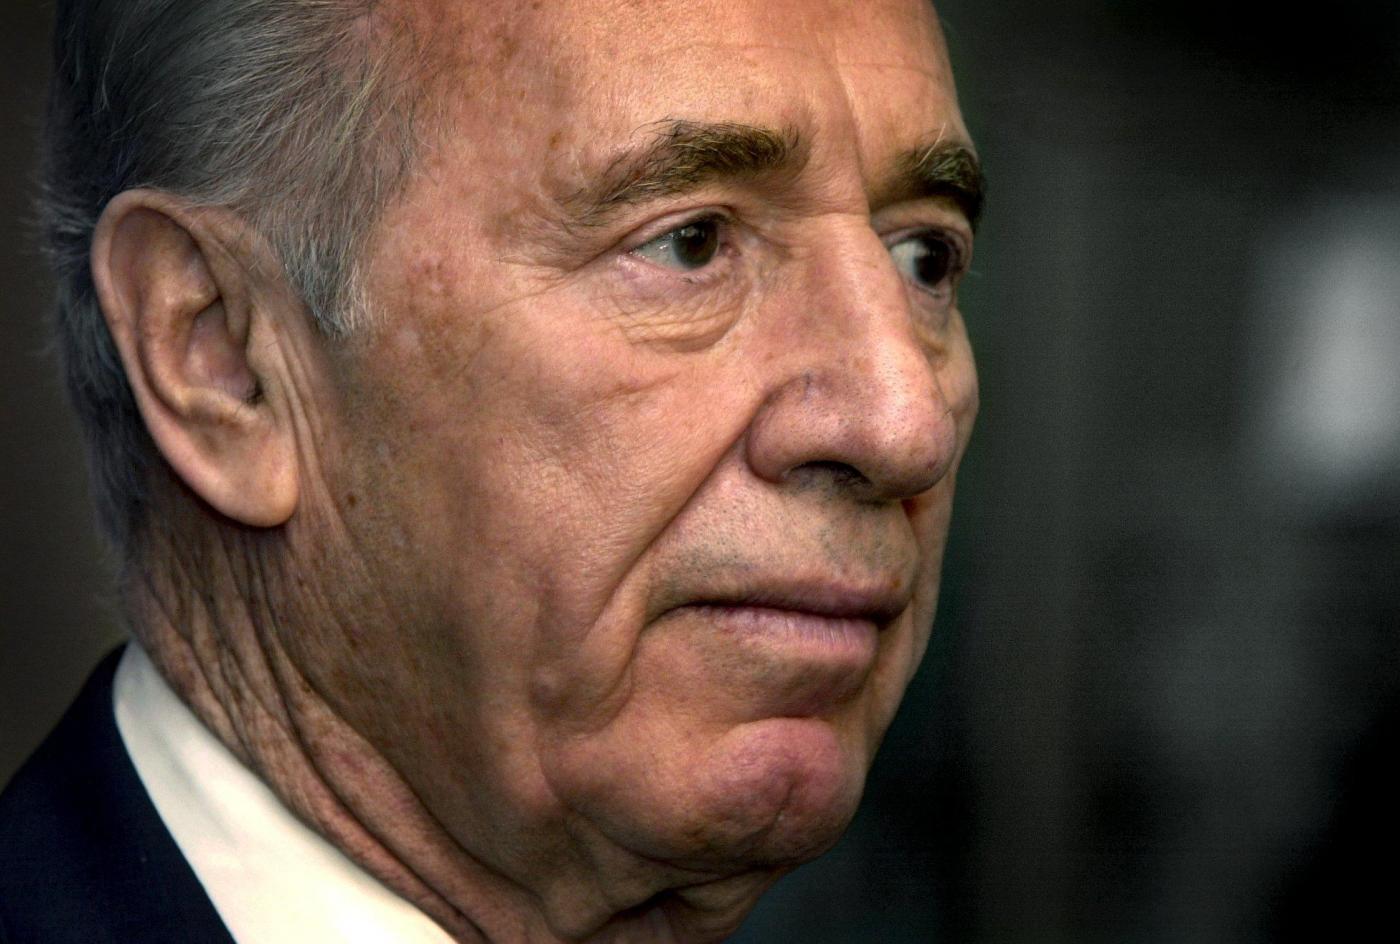 Israele, morto l'ex presidente Shimon Peres